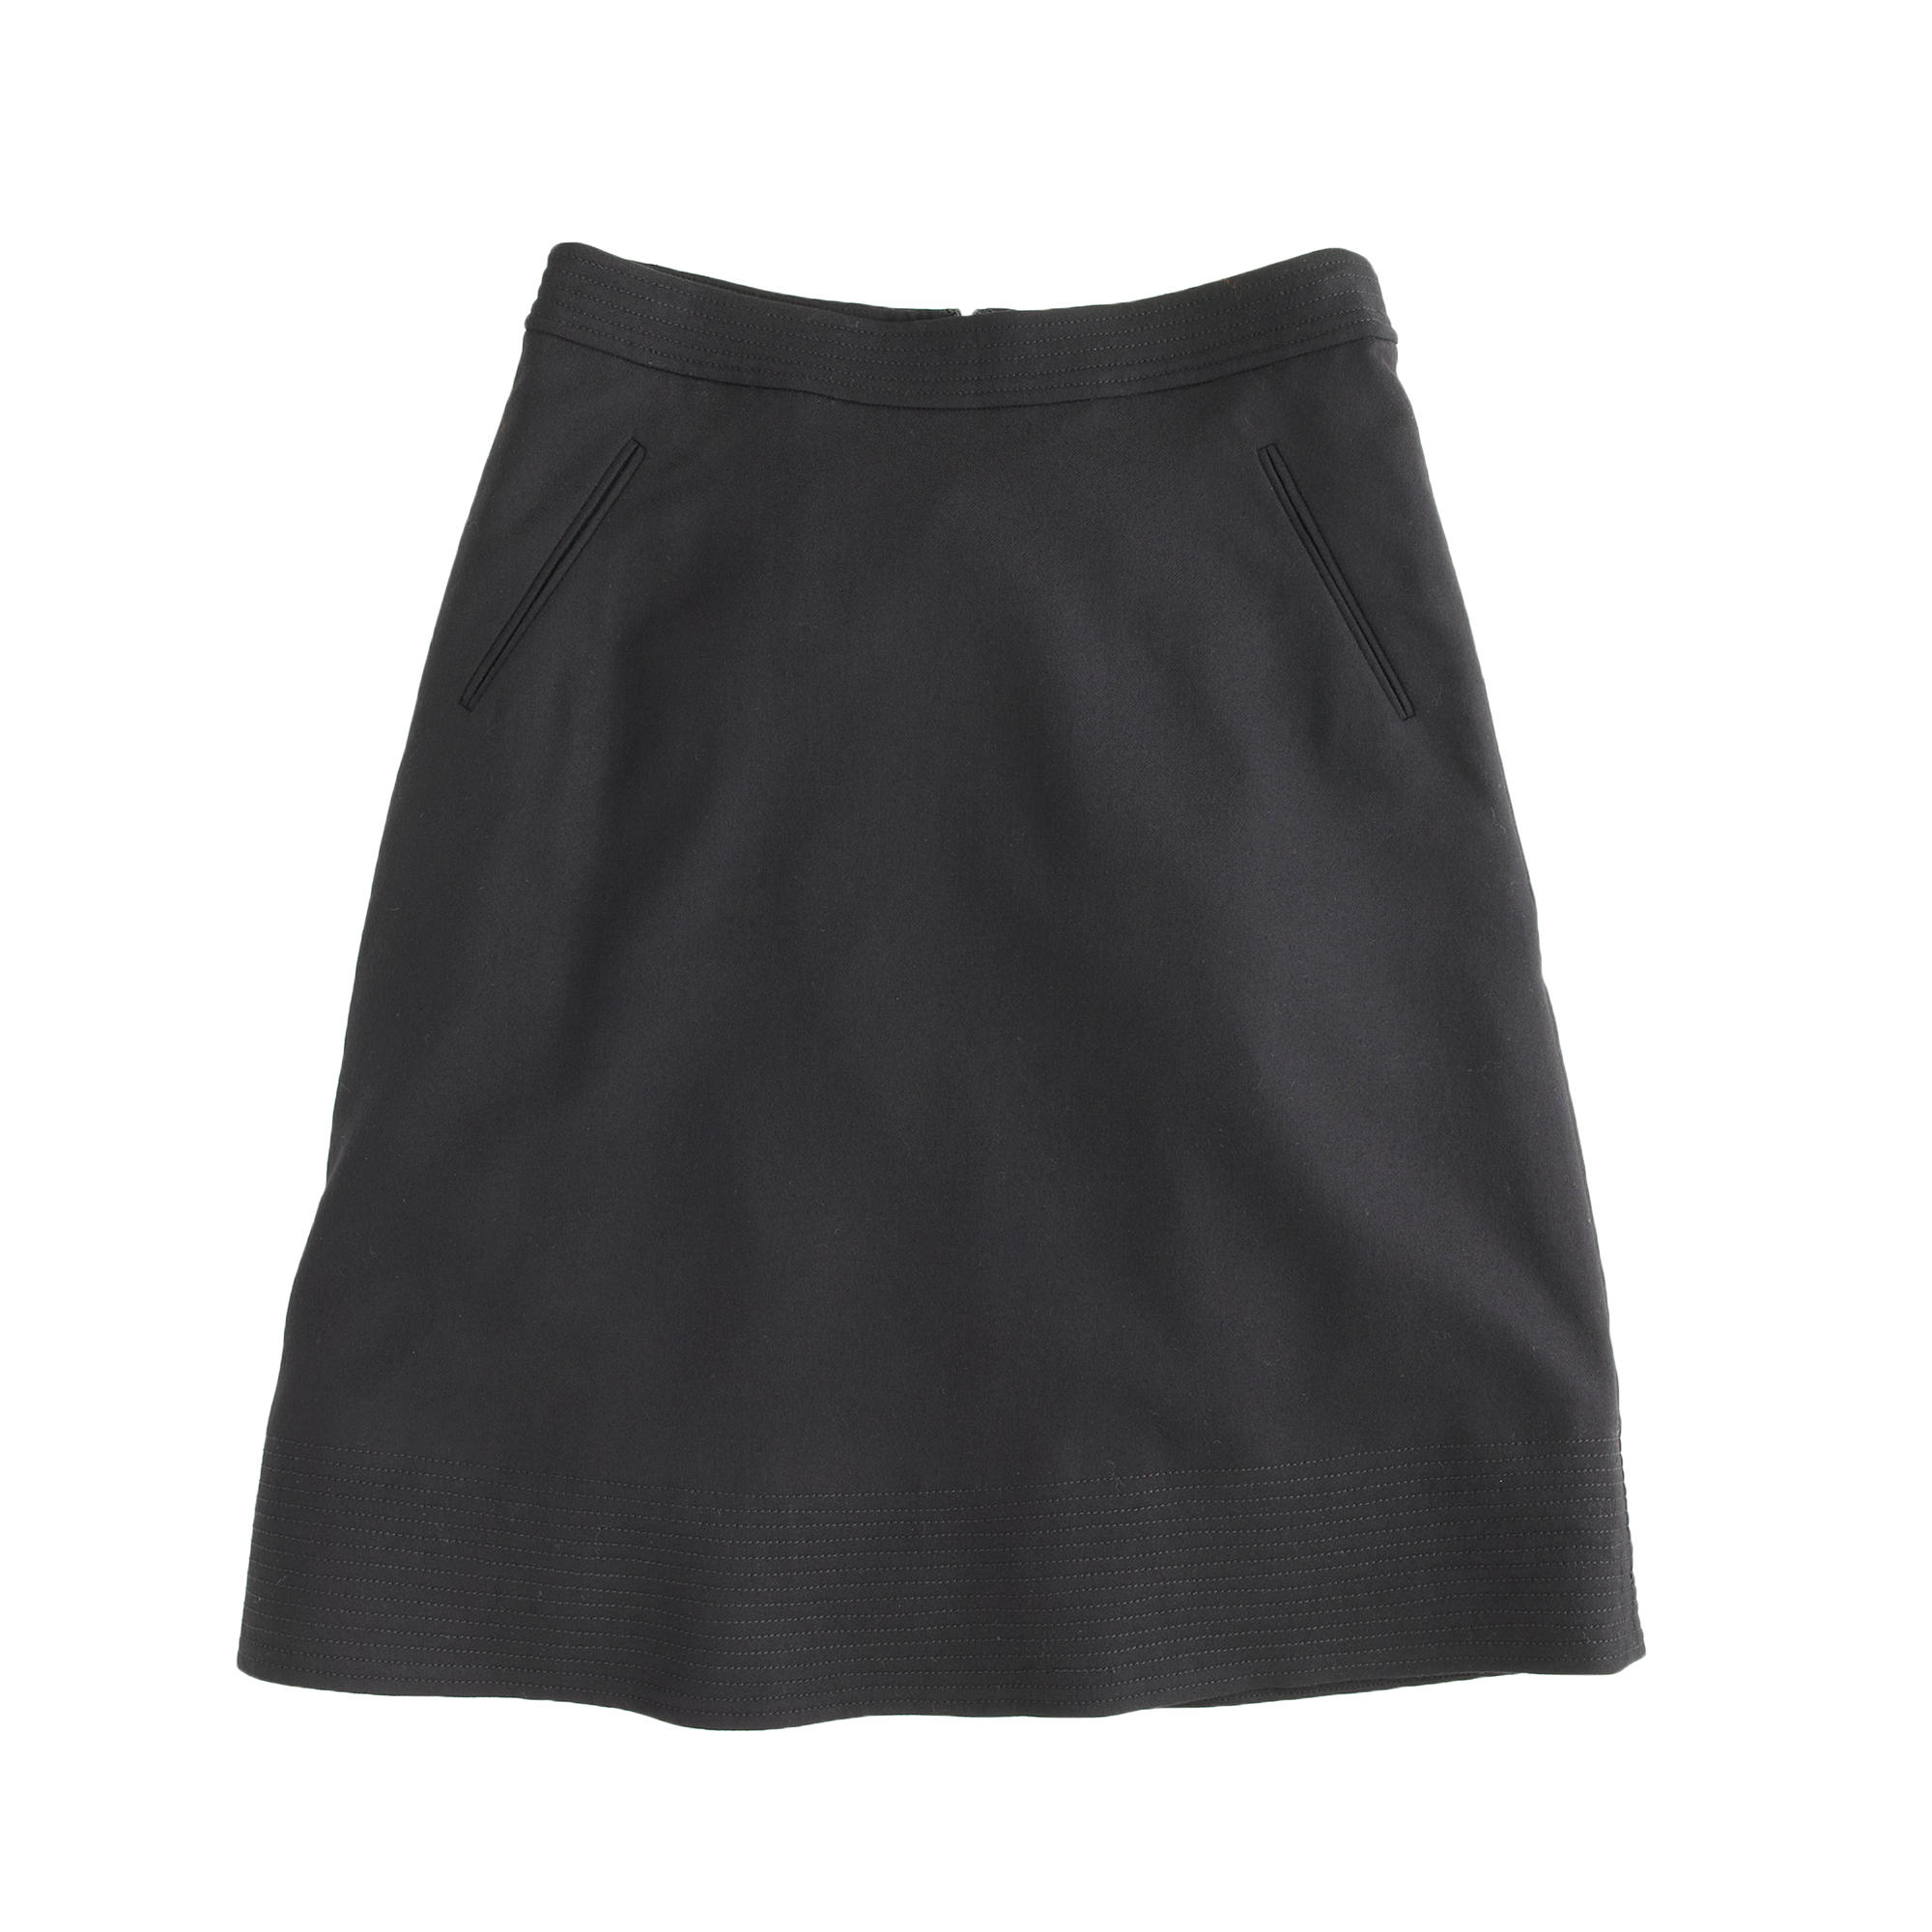 Wool A-line skirt : Women A-line/Midi | J.Crew